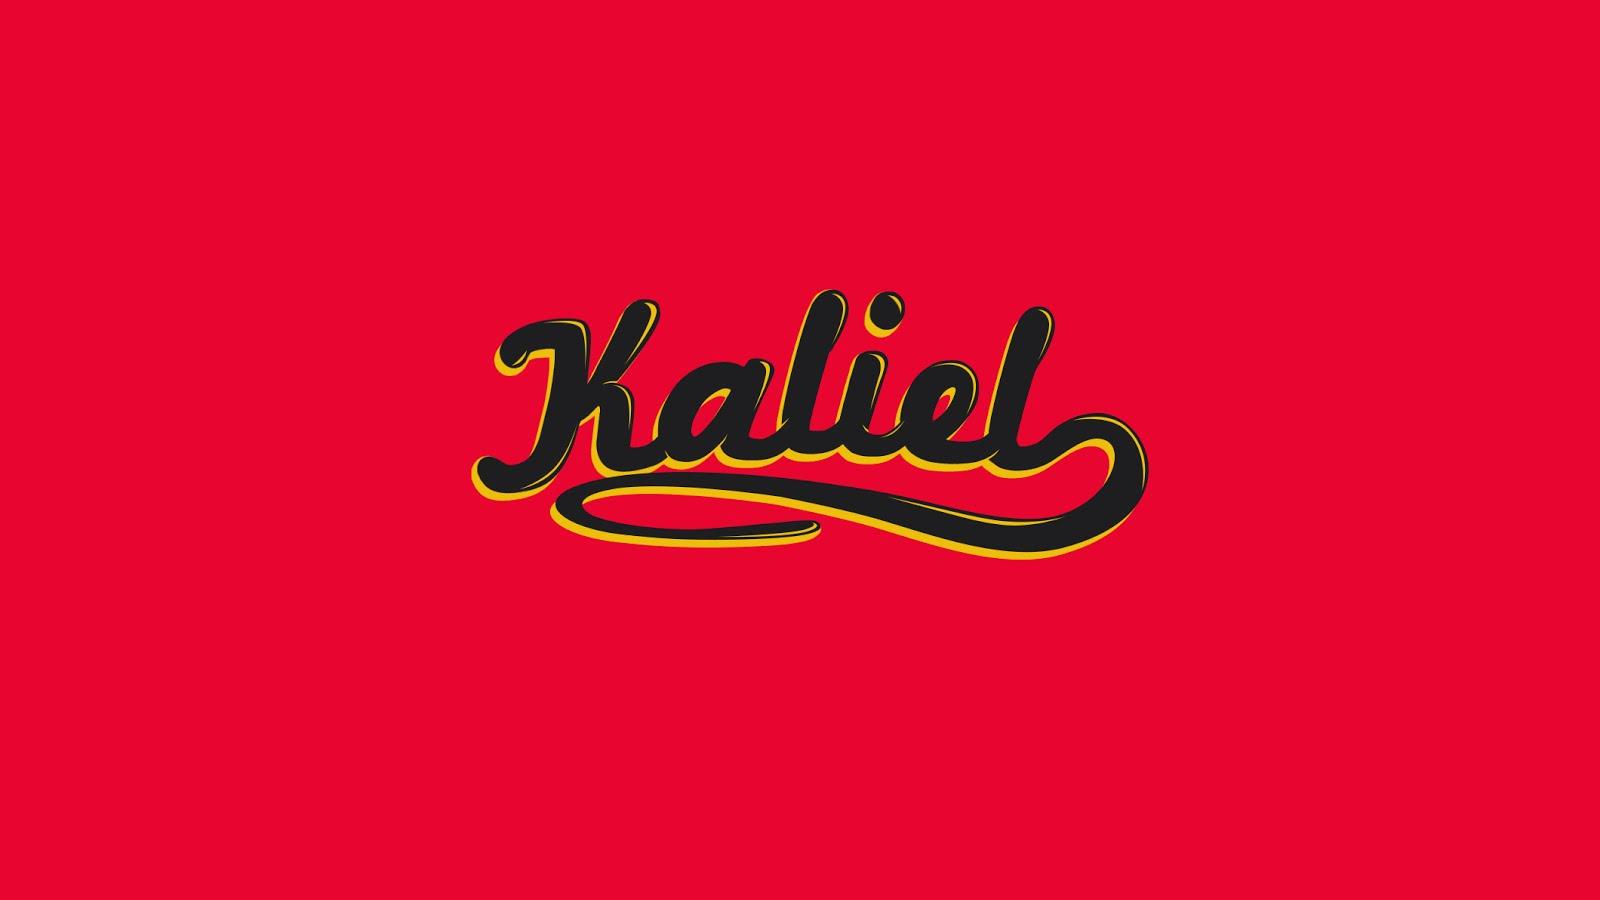 Kaliel art